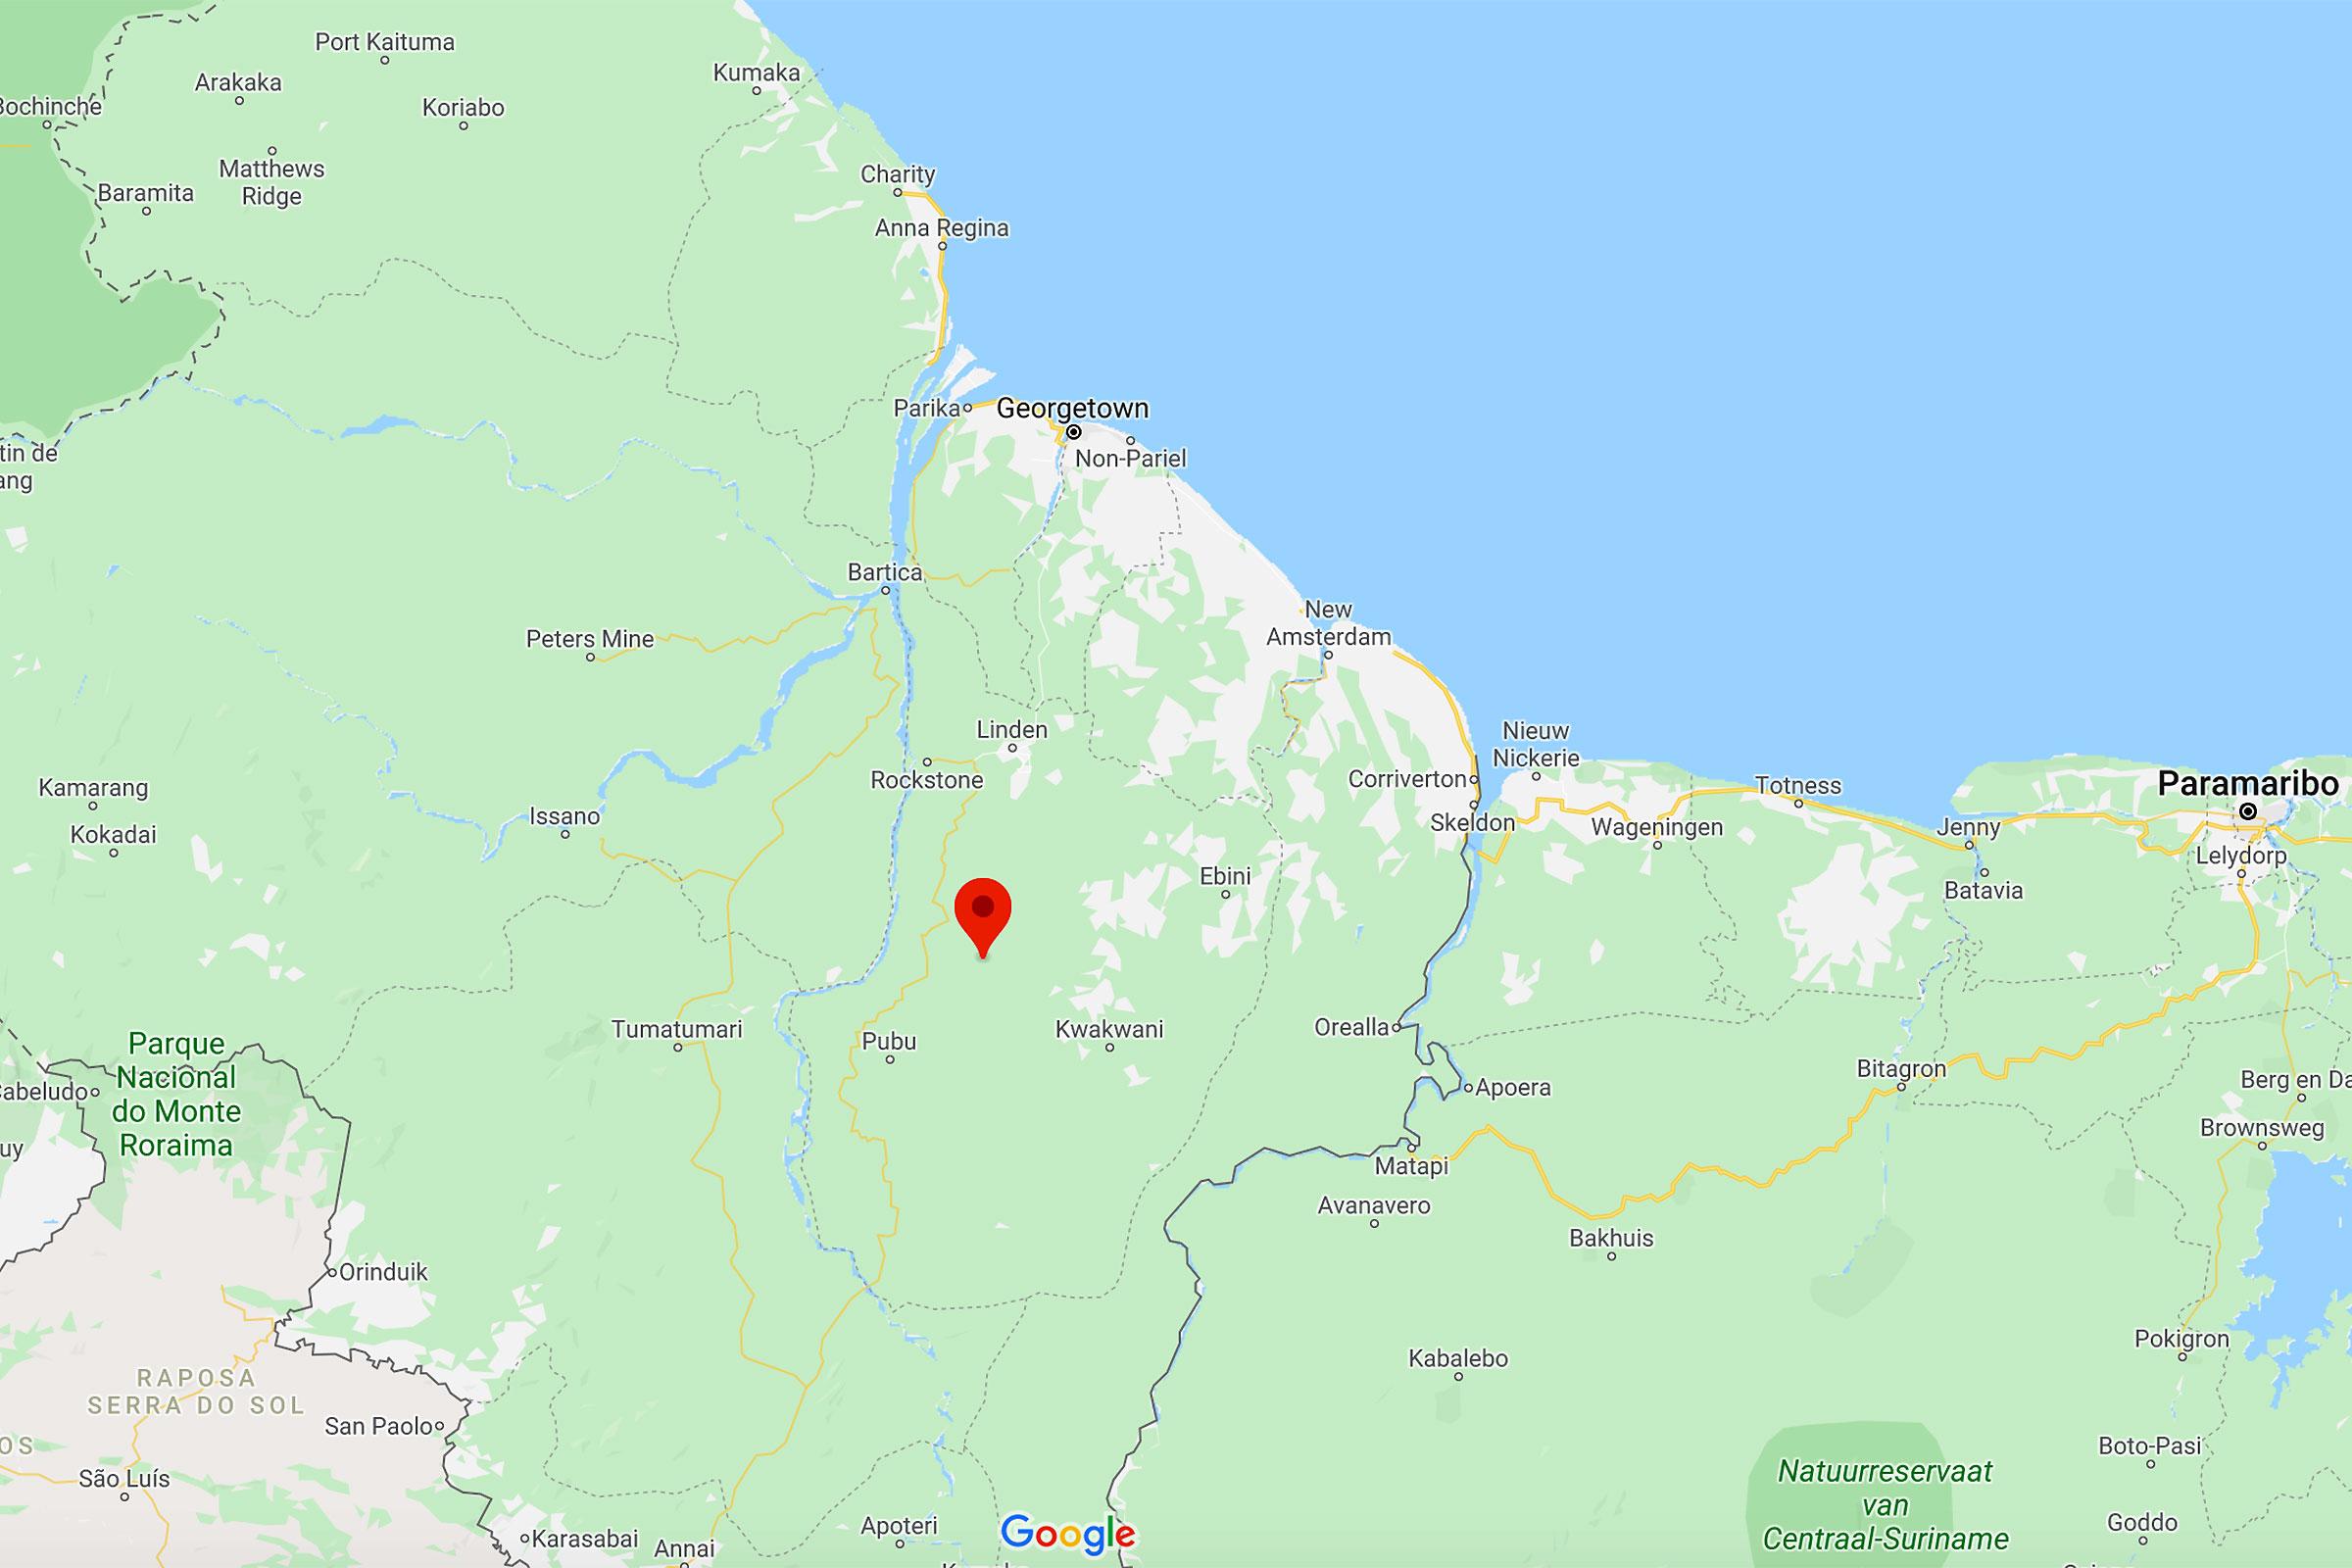 Alto Río Demerara, Guyana.